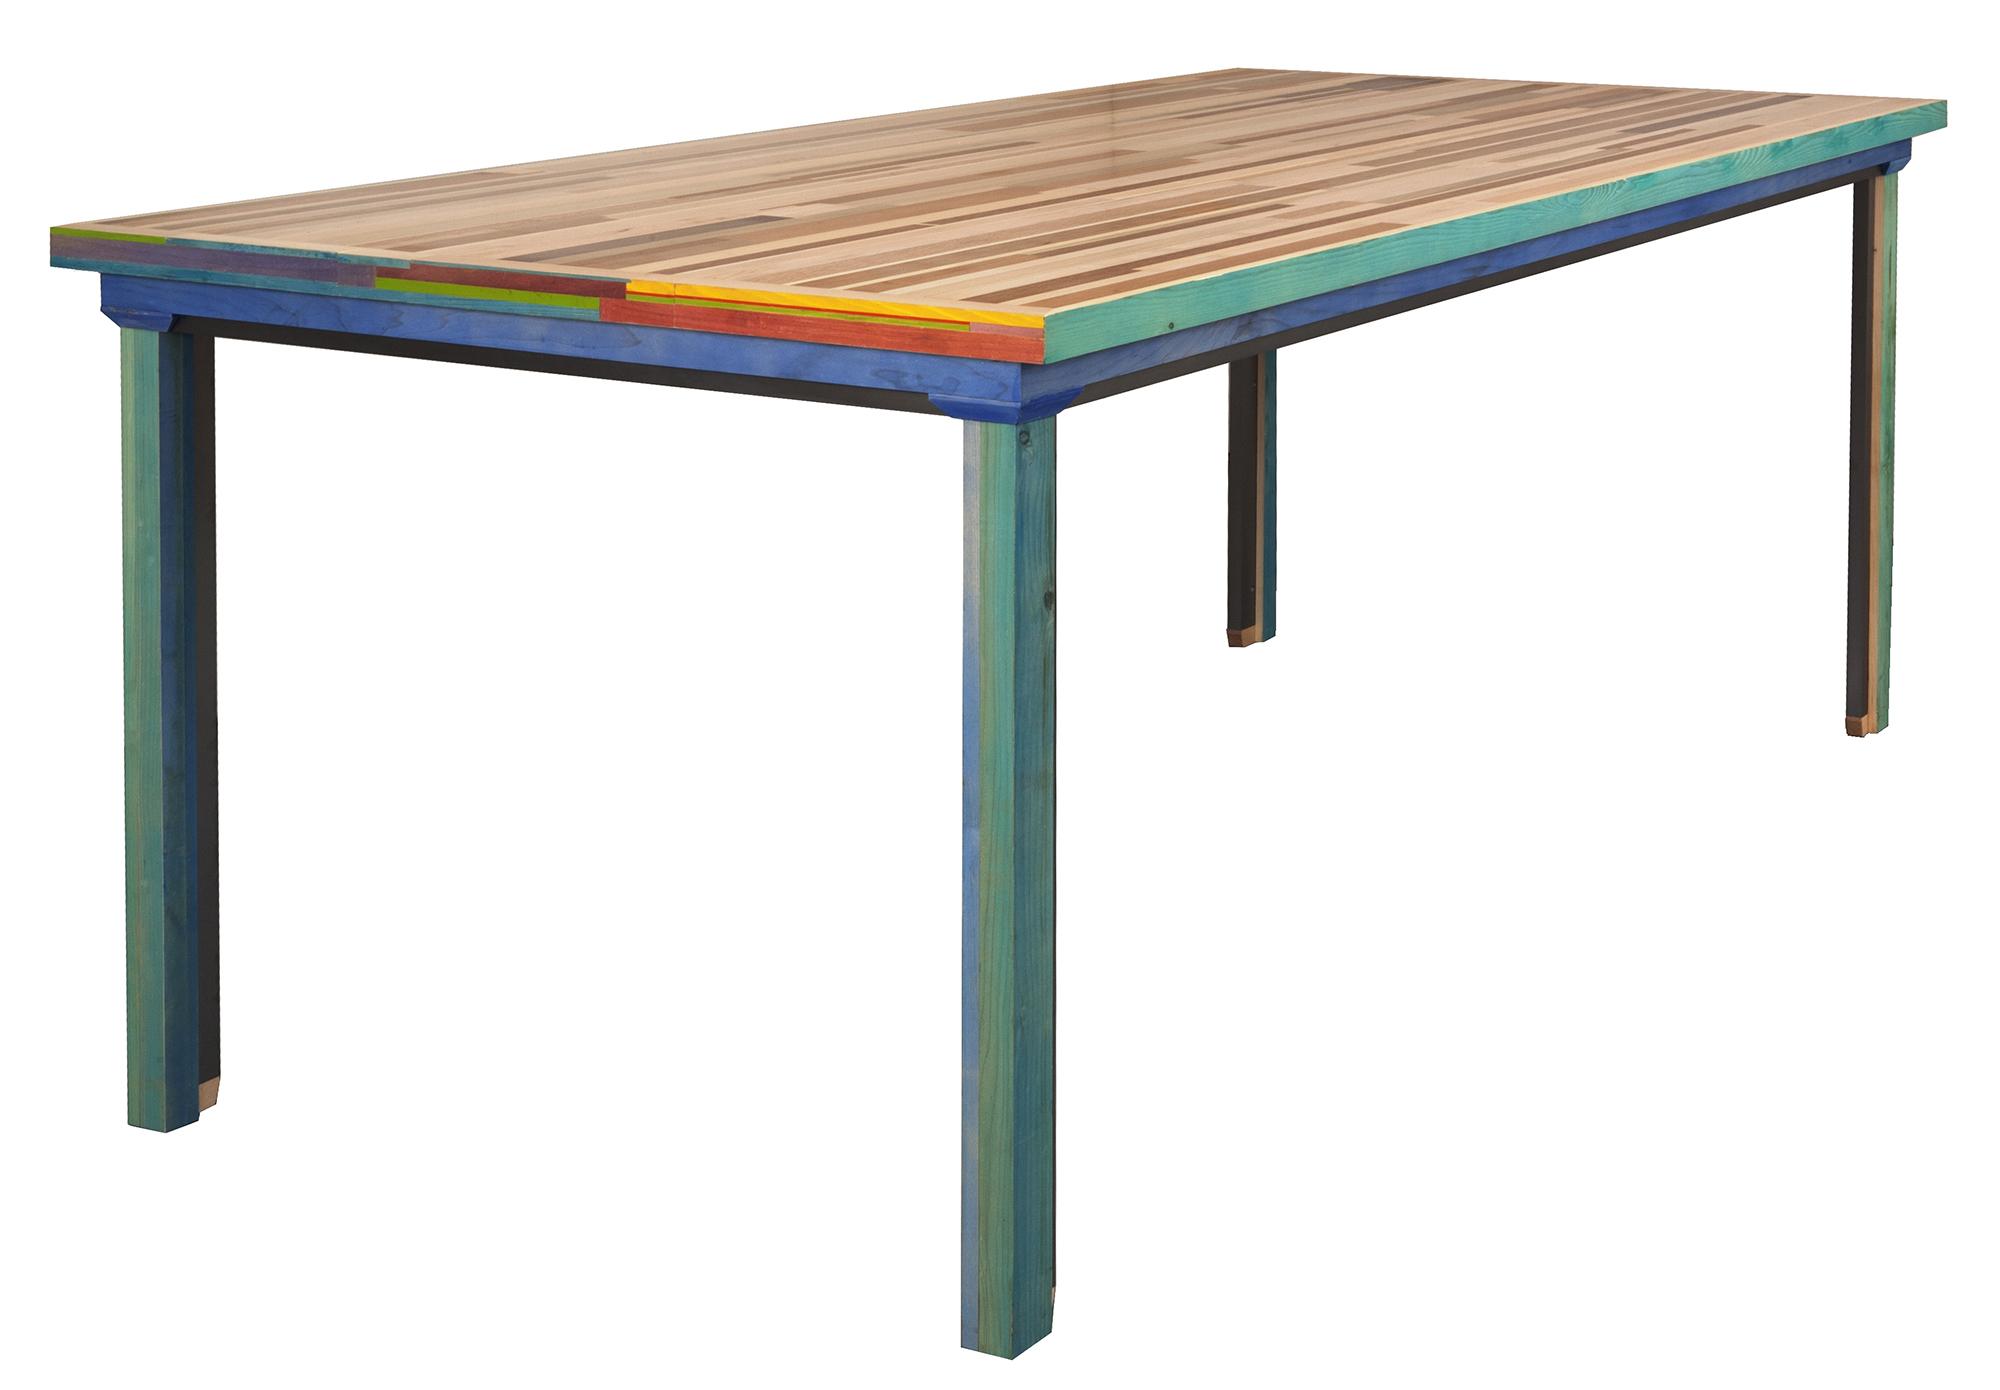 table_100915_BGWHITE2.jpg